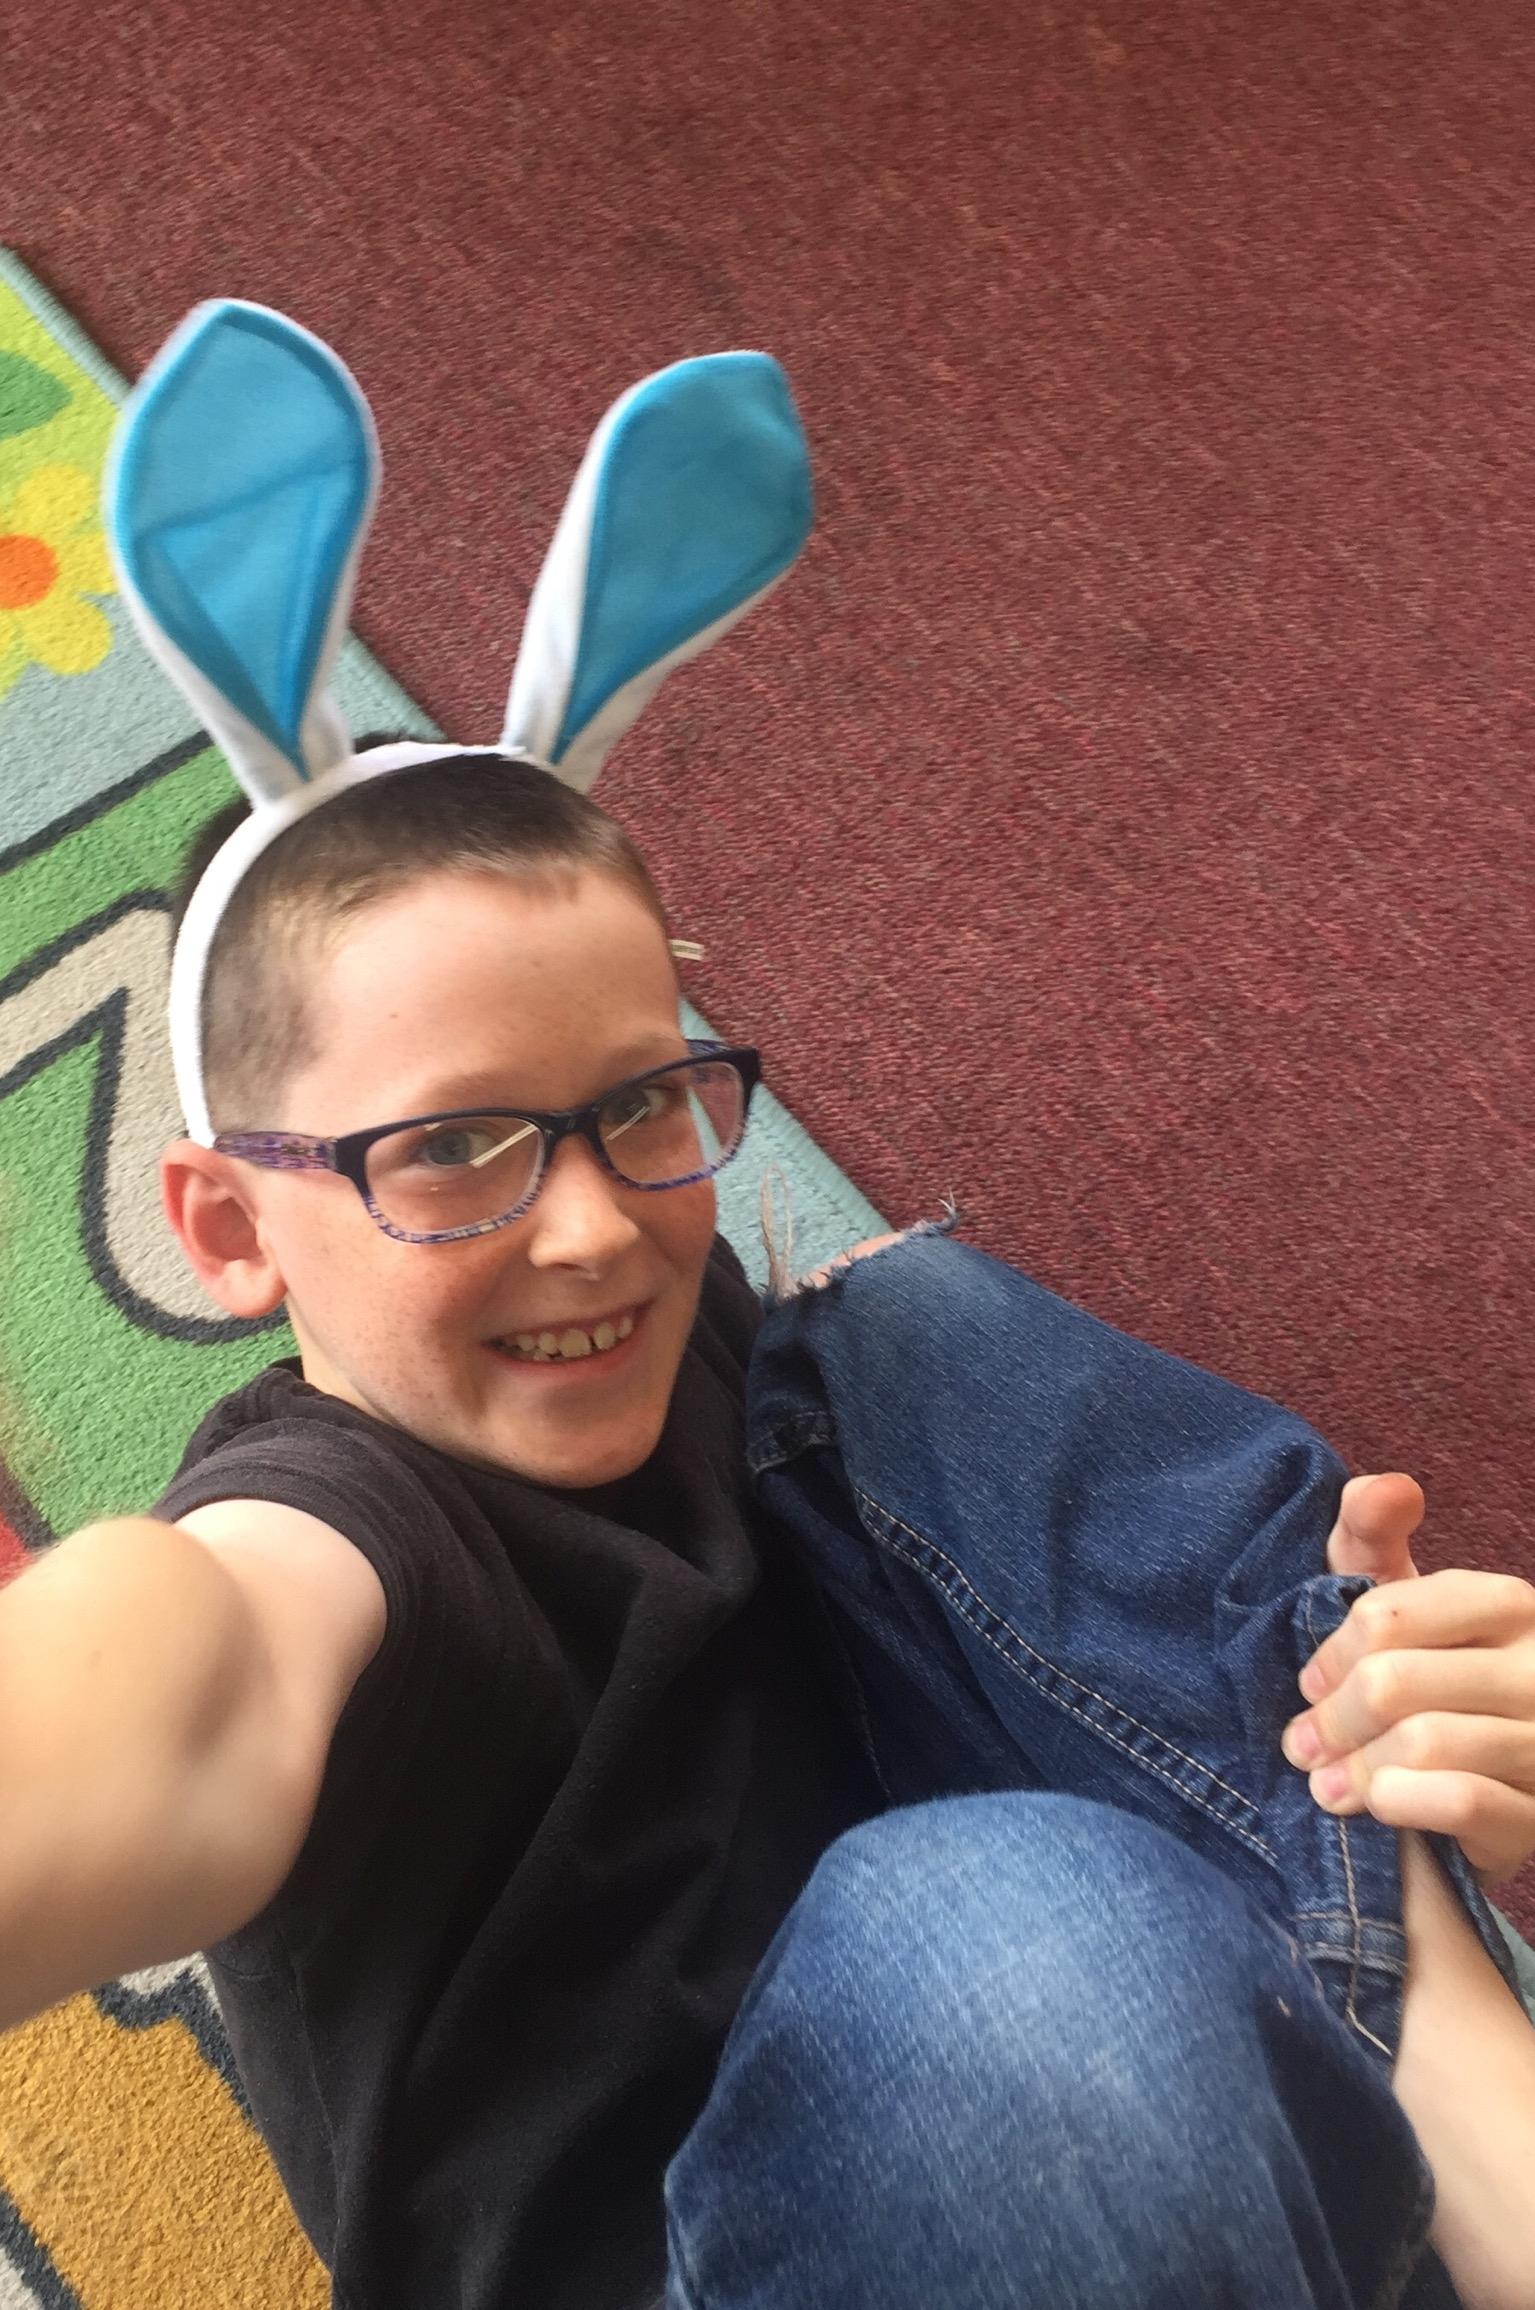 Titus enjoys pretending to be a bunny on Mammal day